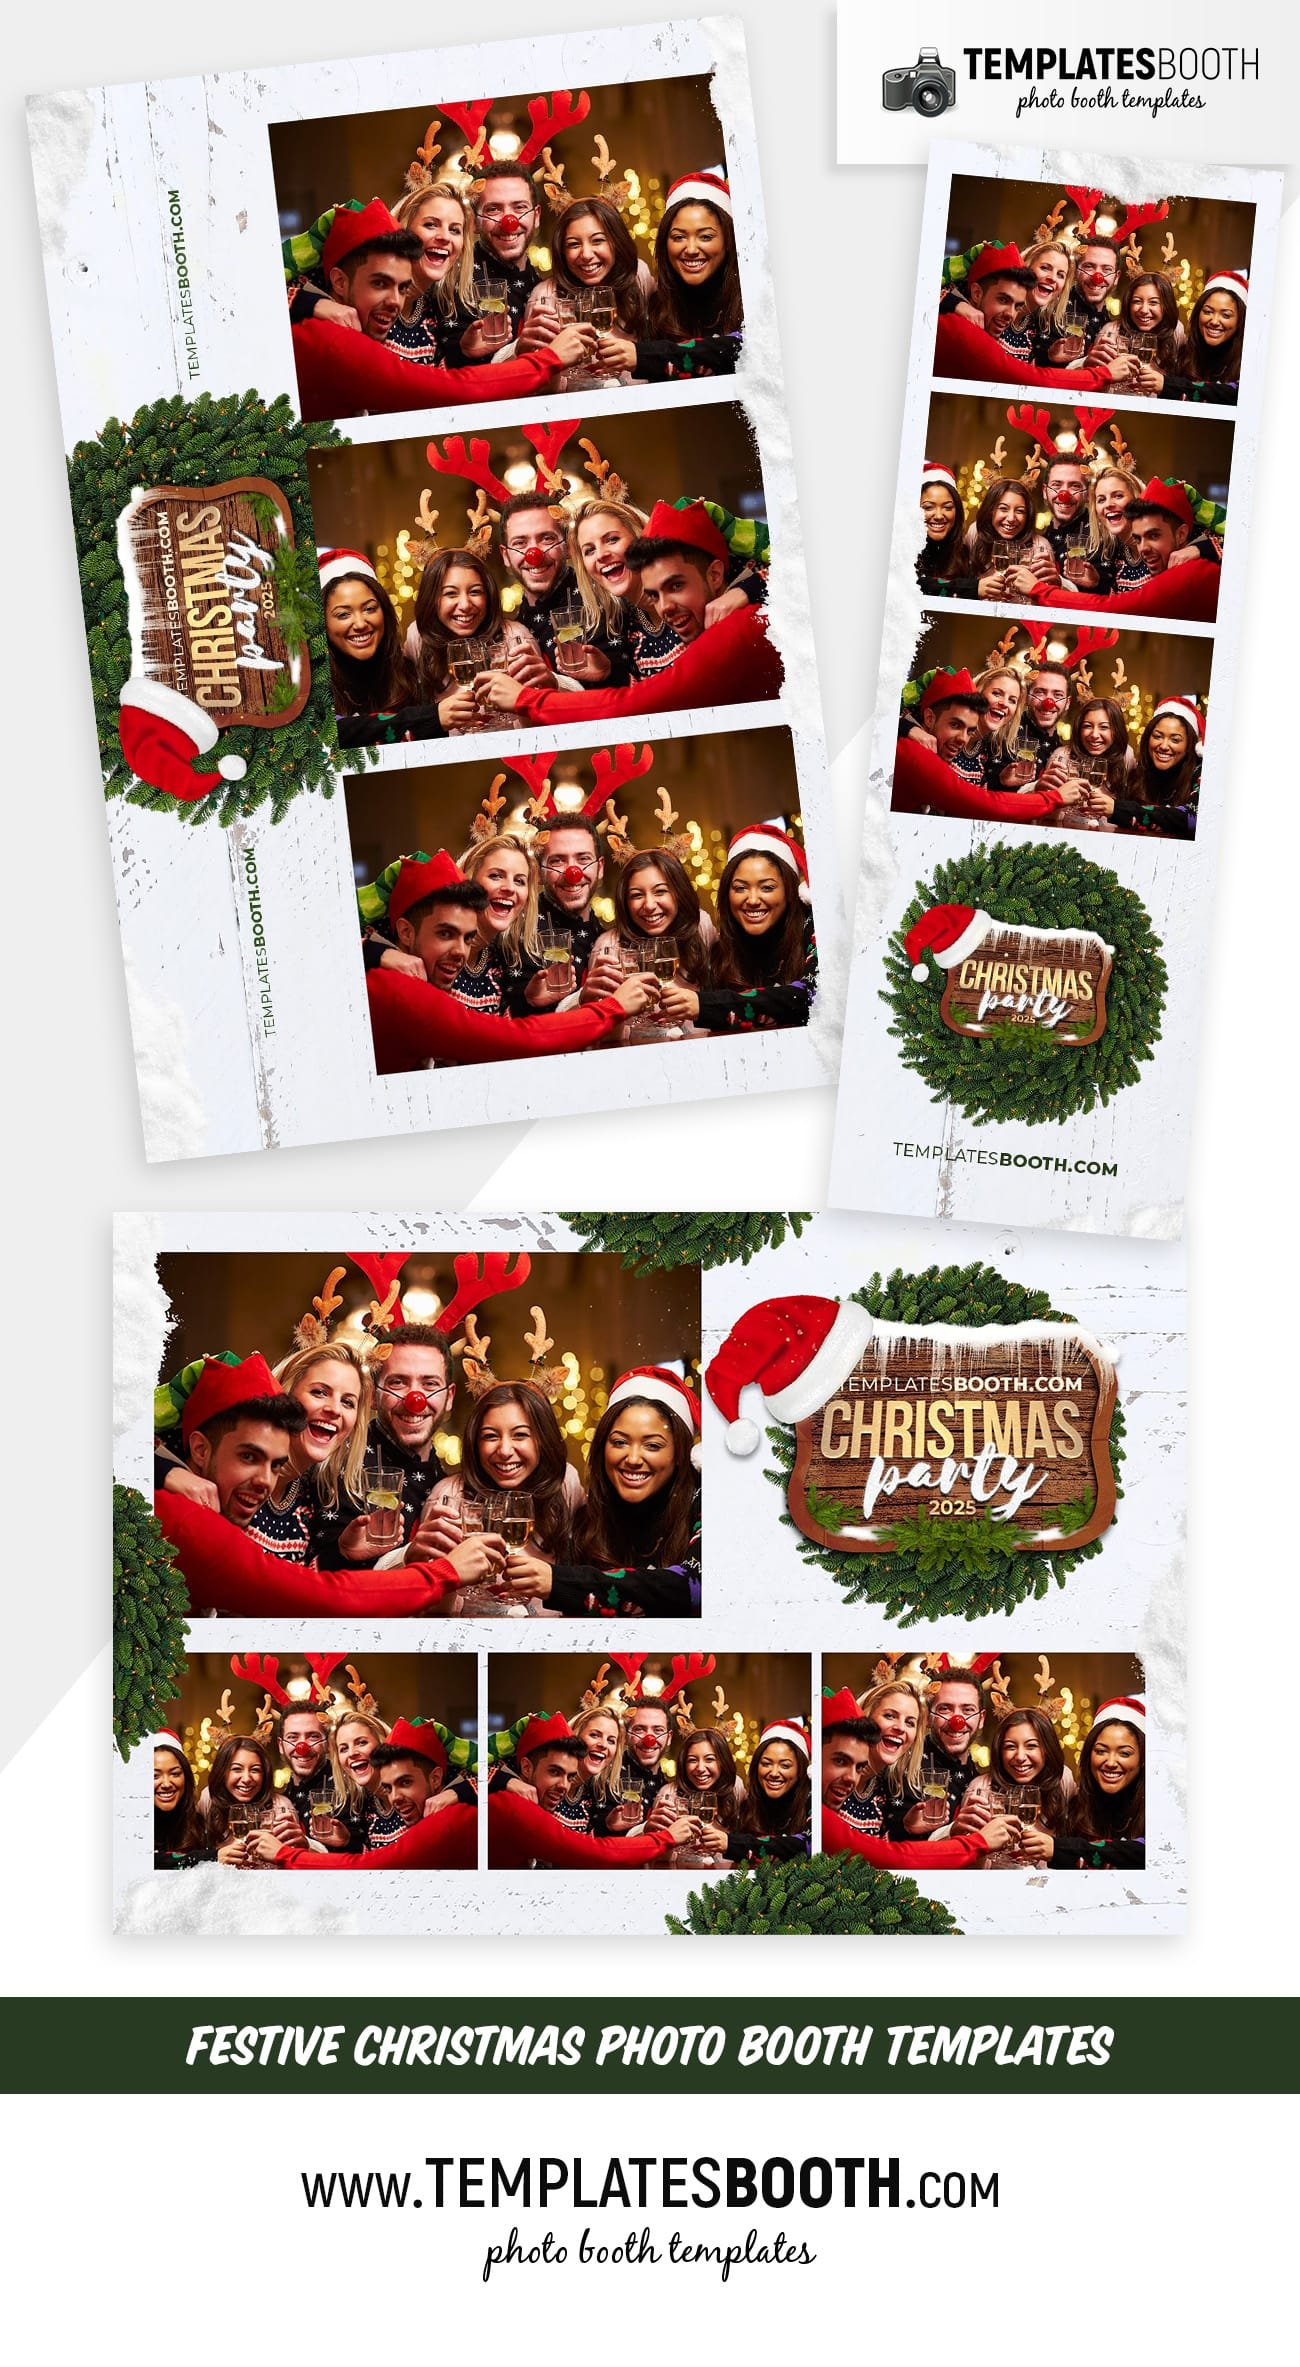 Festive Christmas Photo Booth Templates